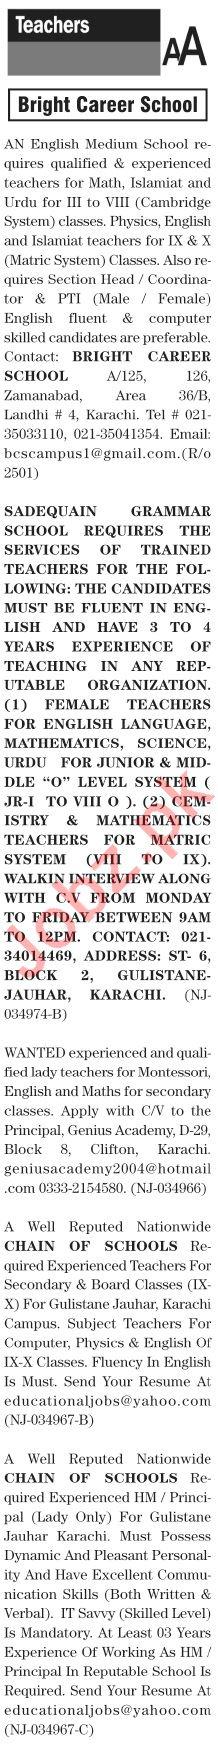 The News Sunday Classified Ads 10 Jan 2021 for Teachers